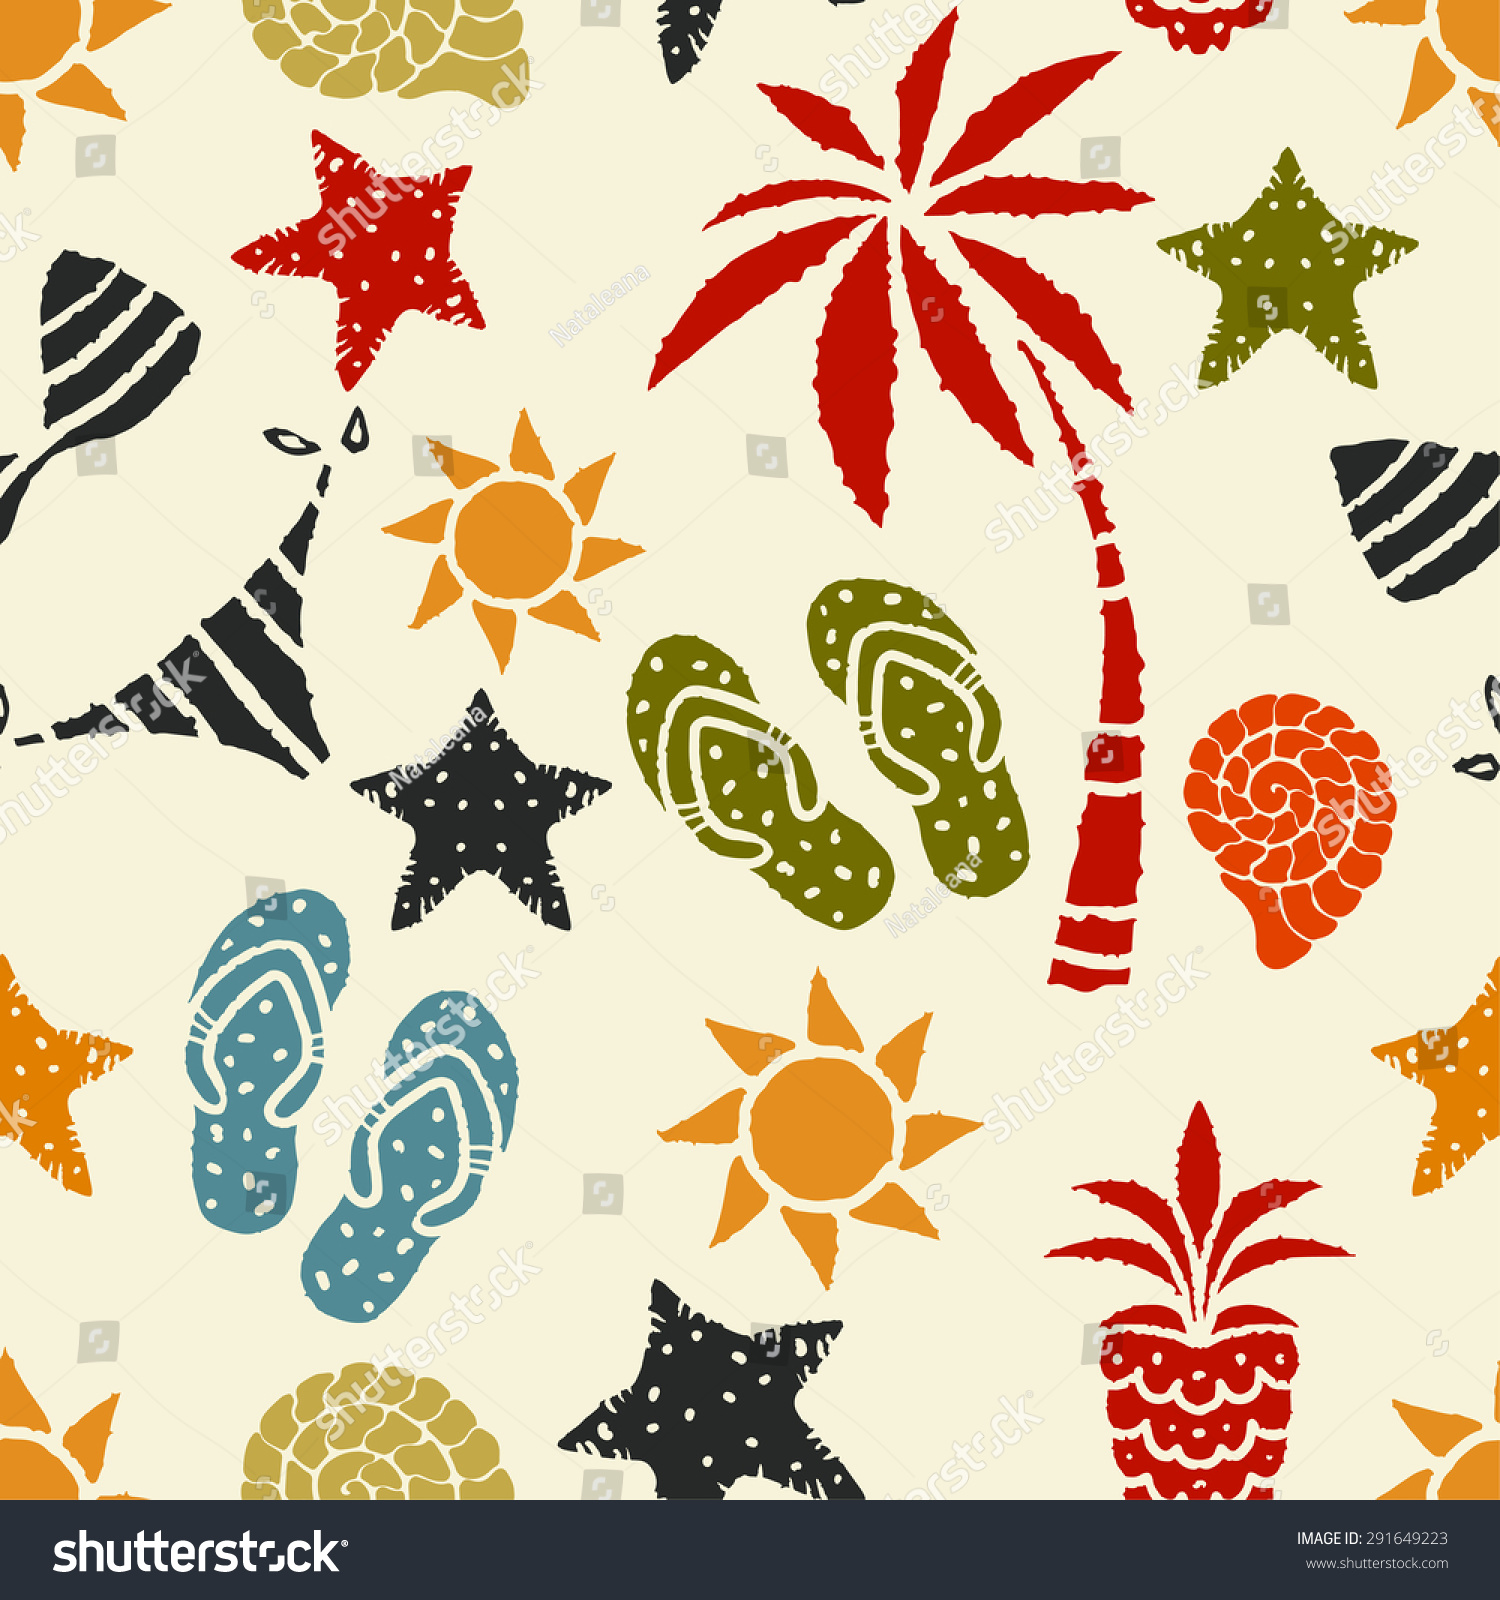 003925acad686 Seamless Pattern Sun Palm Tree Pineapple Stock Vector (Royalty Free ...